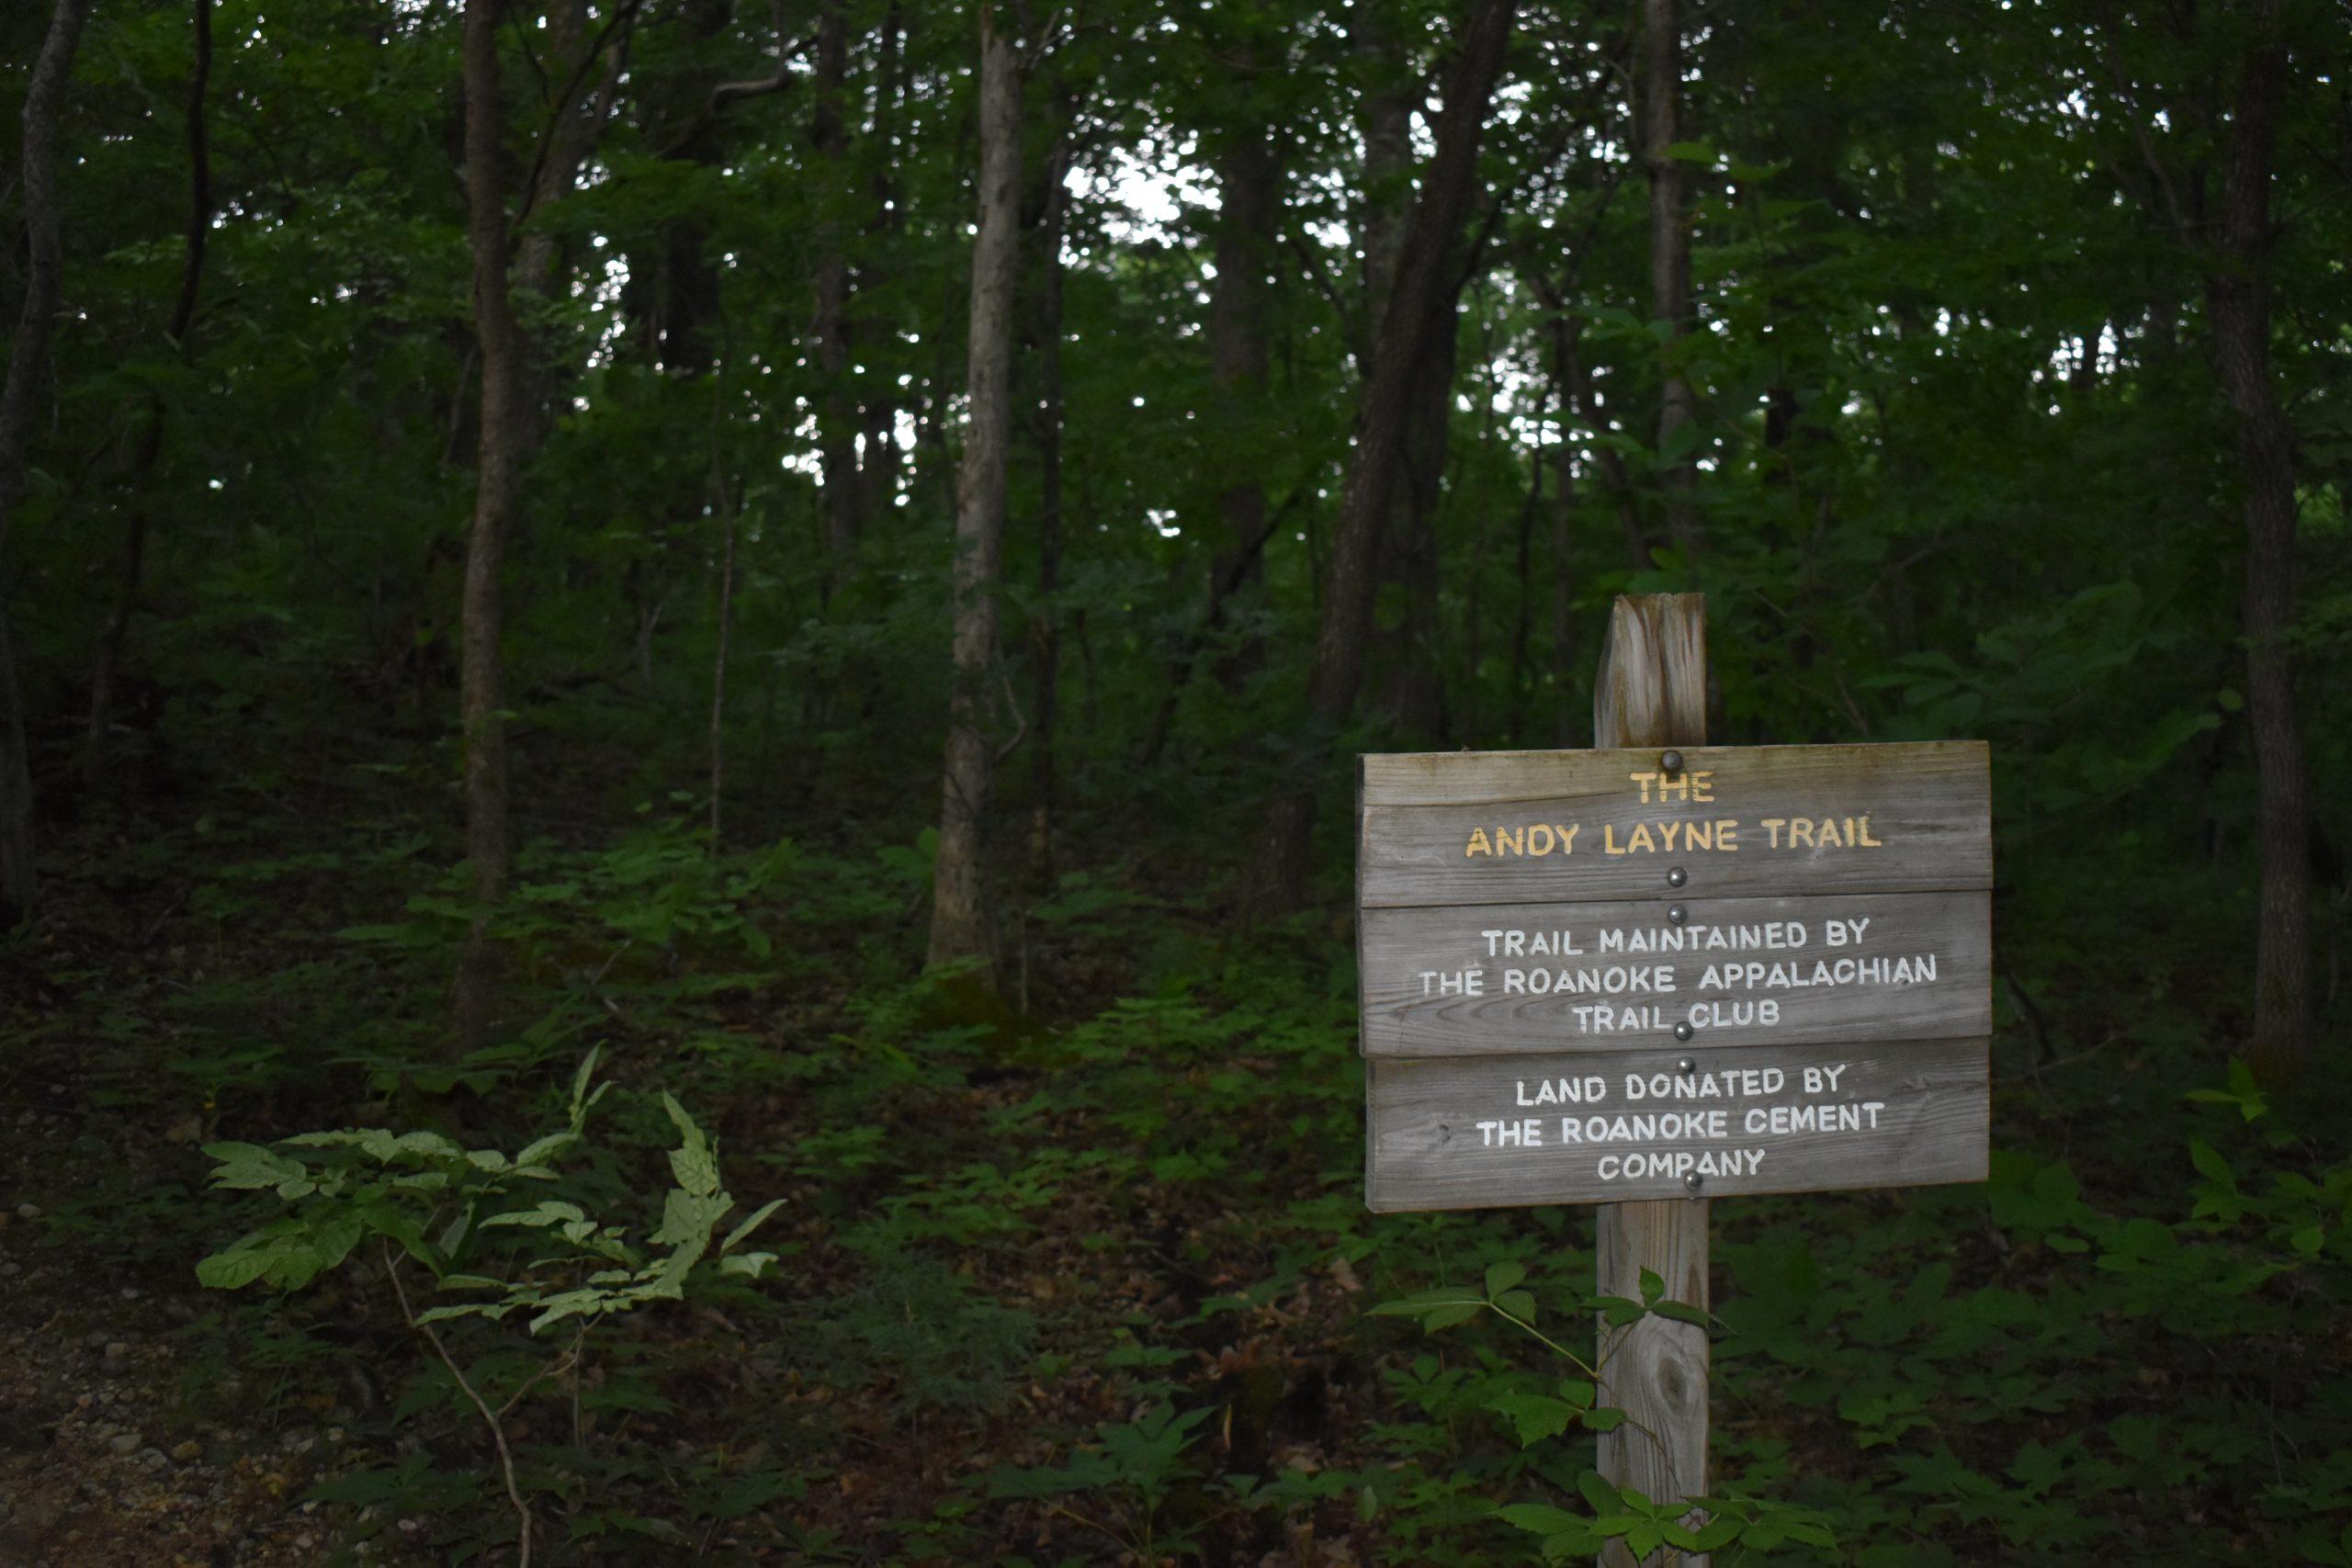 Tinker Cliffs via Andy Layne Trail - Yoanoke